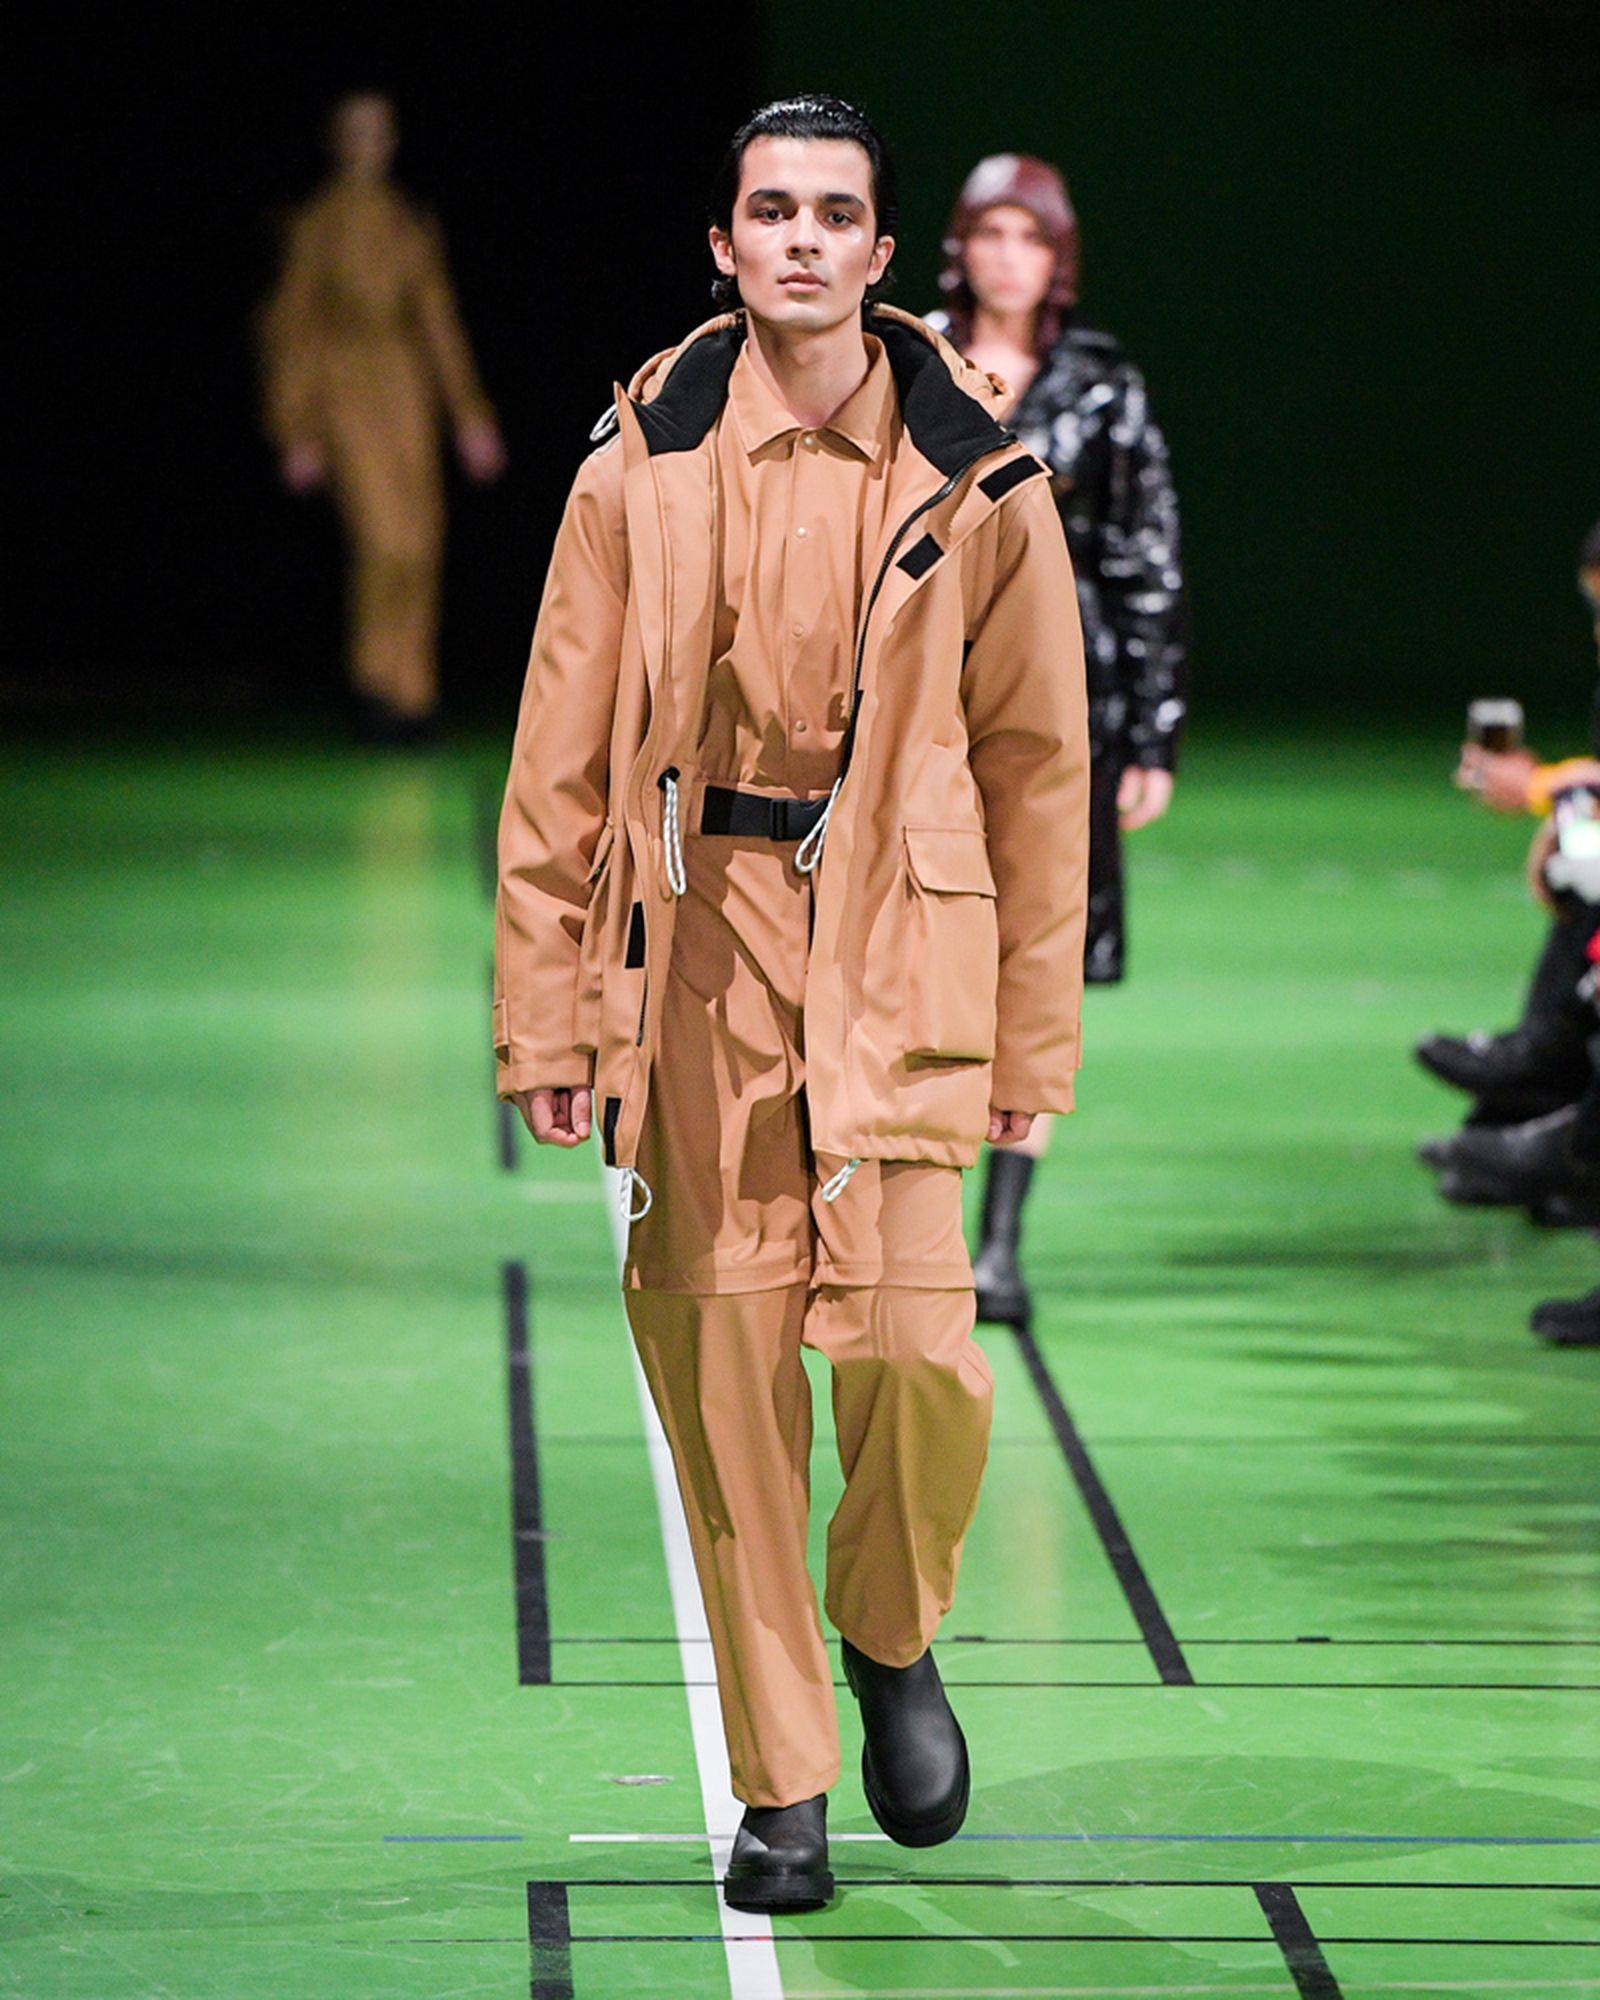 future-fashion-week-copenhagen-rains-4